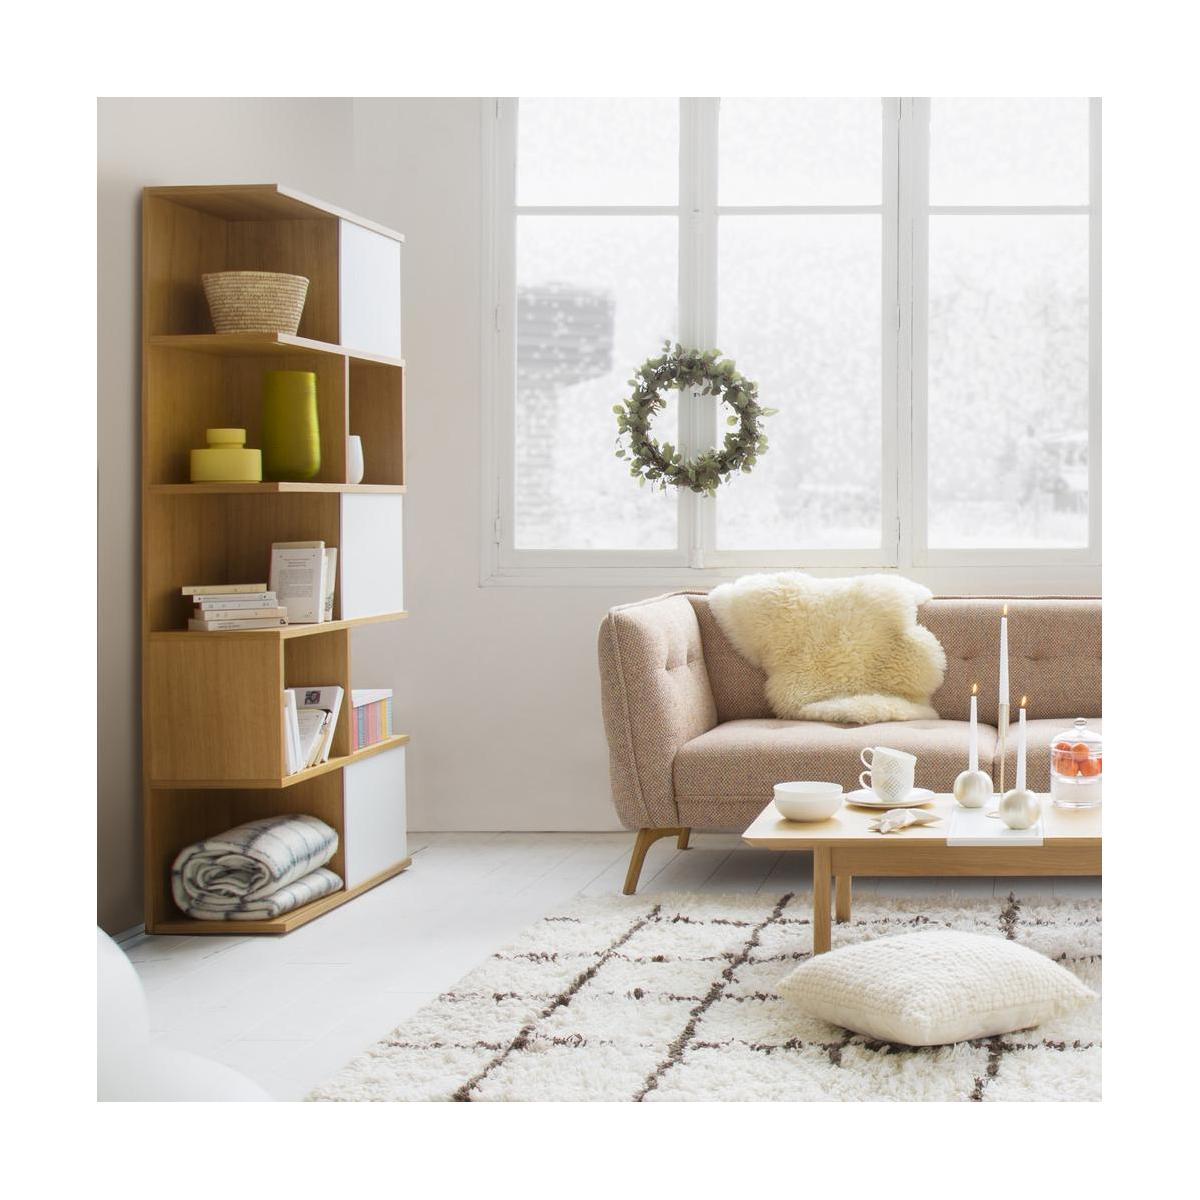 bibliotheque salon minimaliste